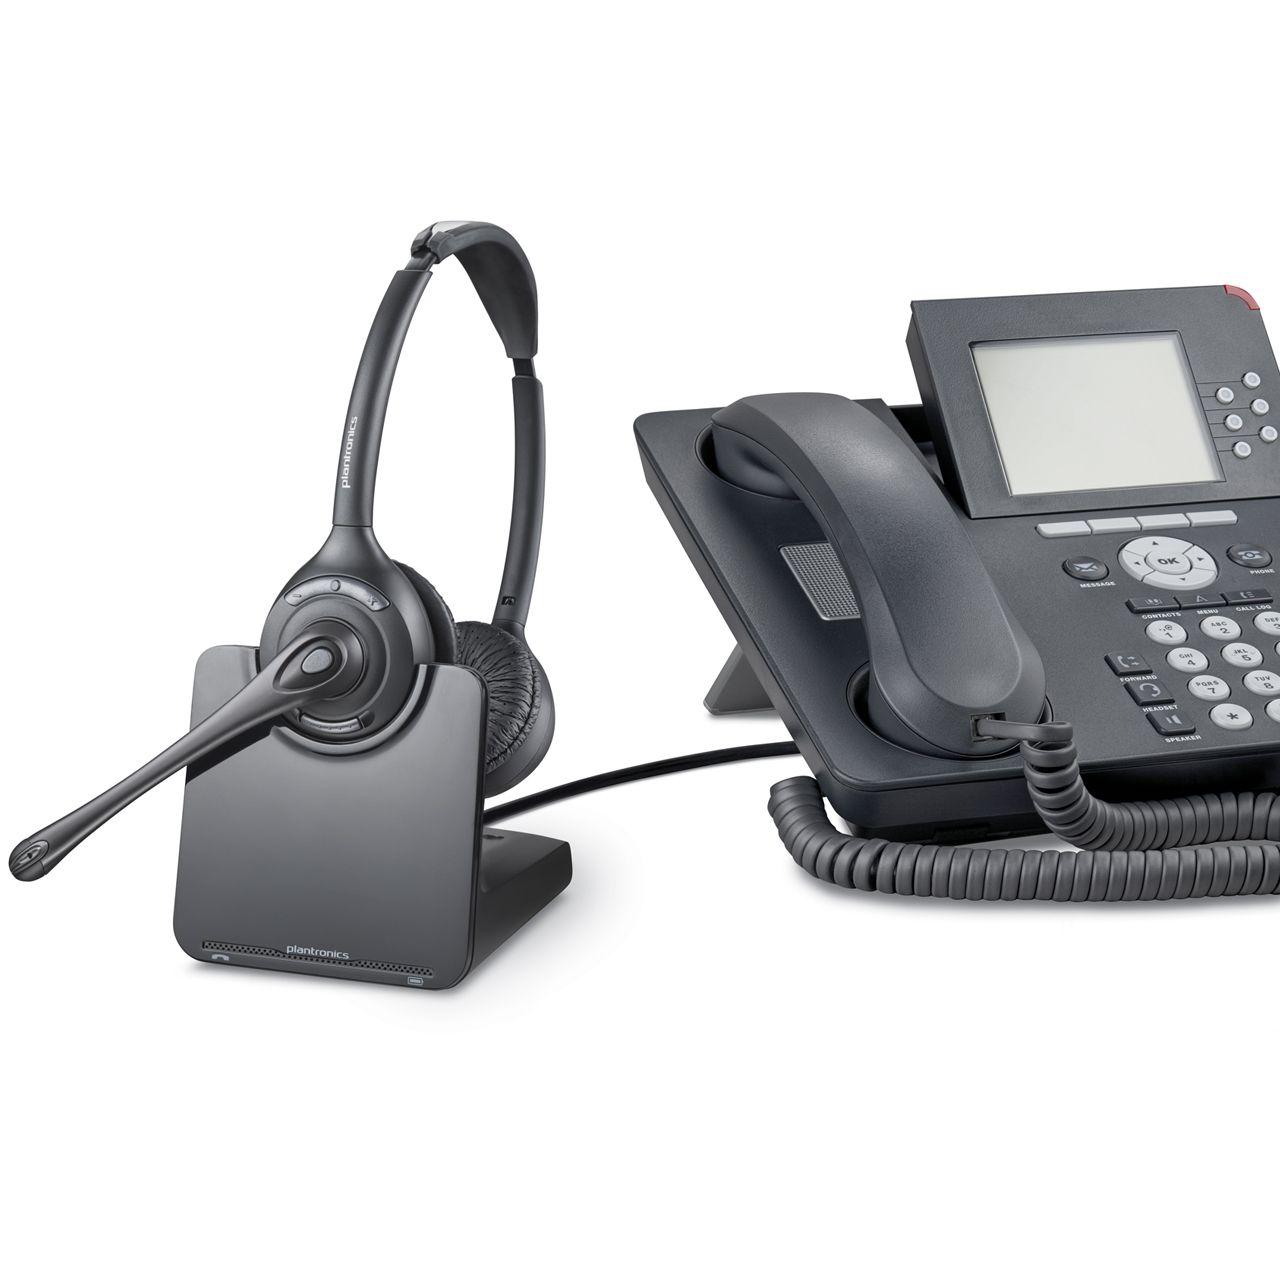 Plantronics cs520 binaural headset ERKACS520 0001 Met Telefoon